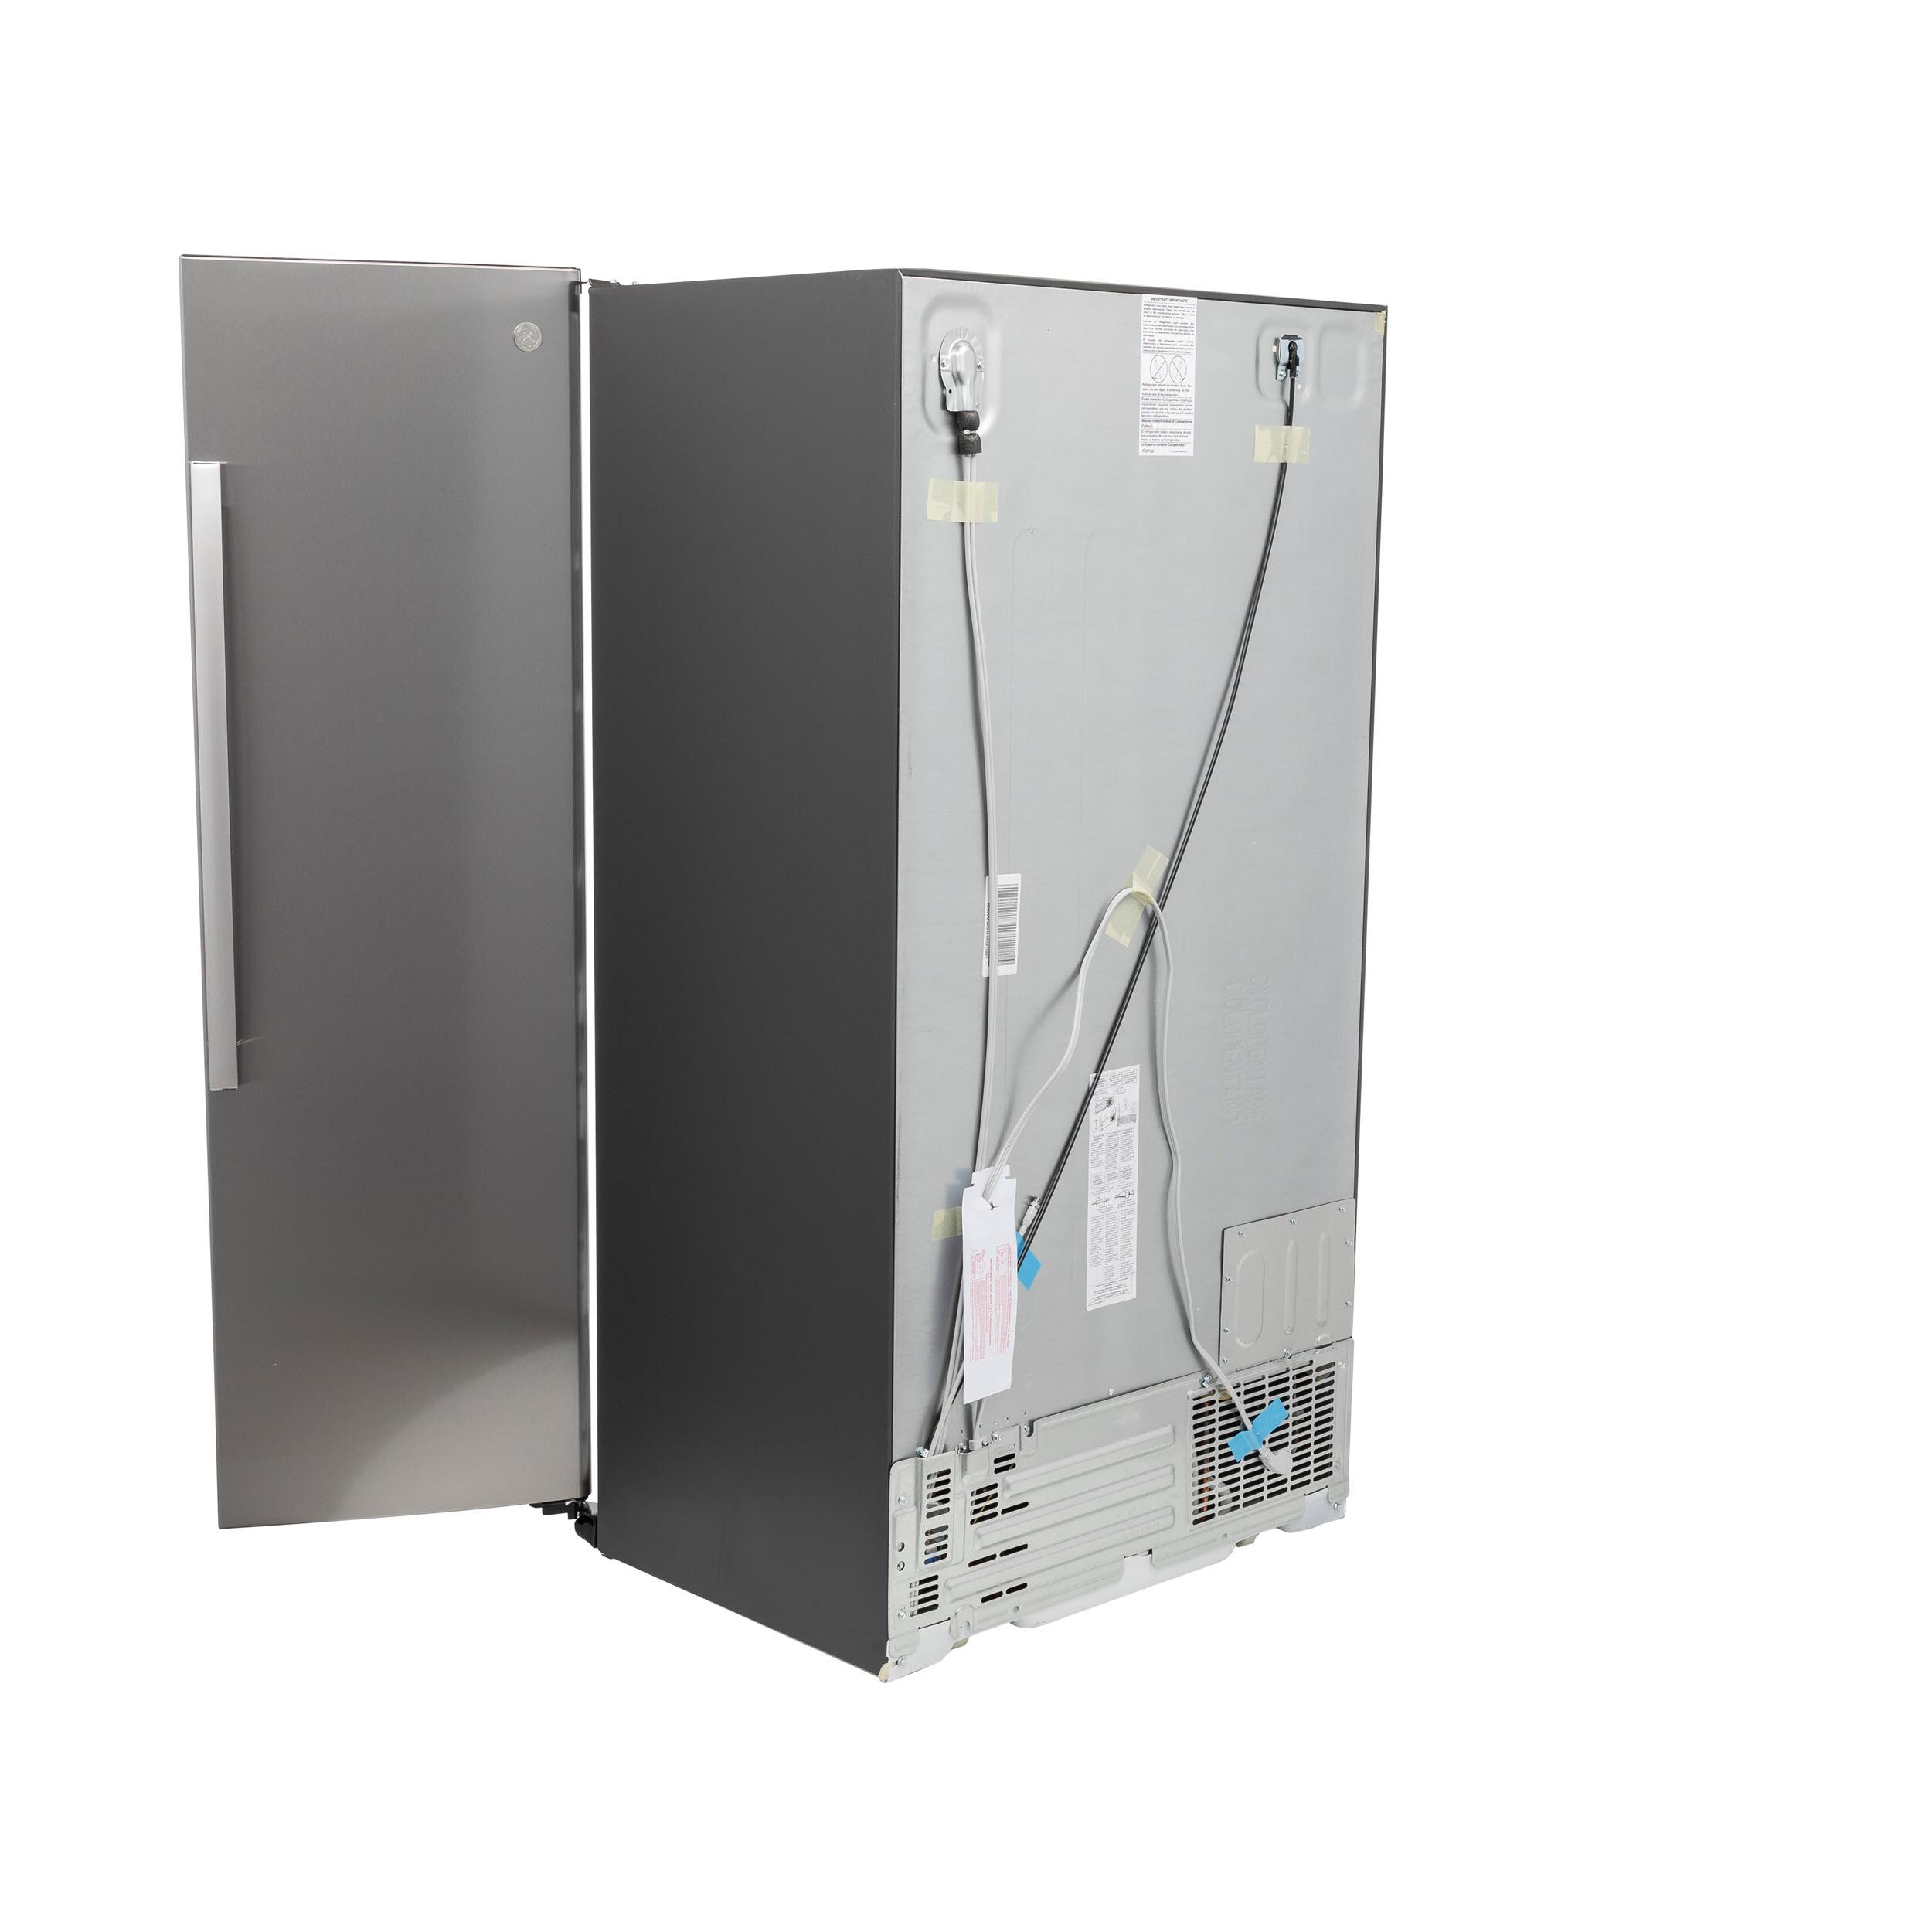 Model: PZS22MYKFS | GE Profile GE Profile™ Series 21.9 Cu. Ft. Counter-Depth Side-By-Side Refrigerator